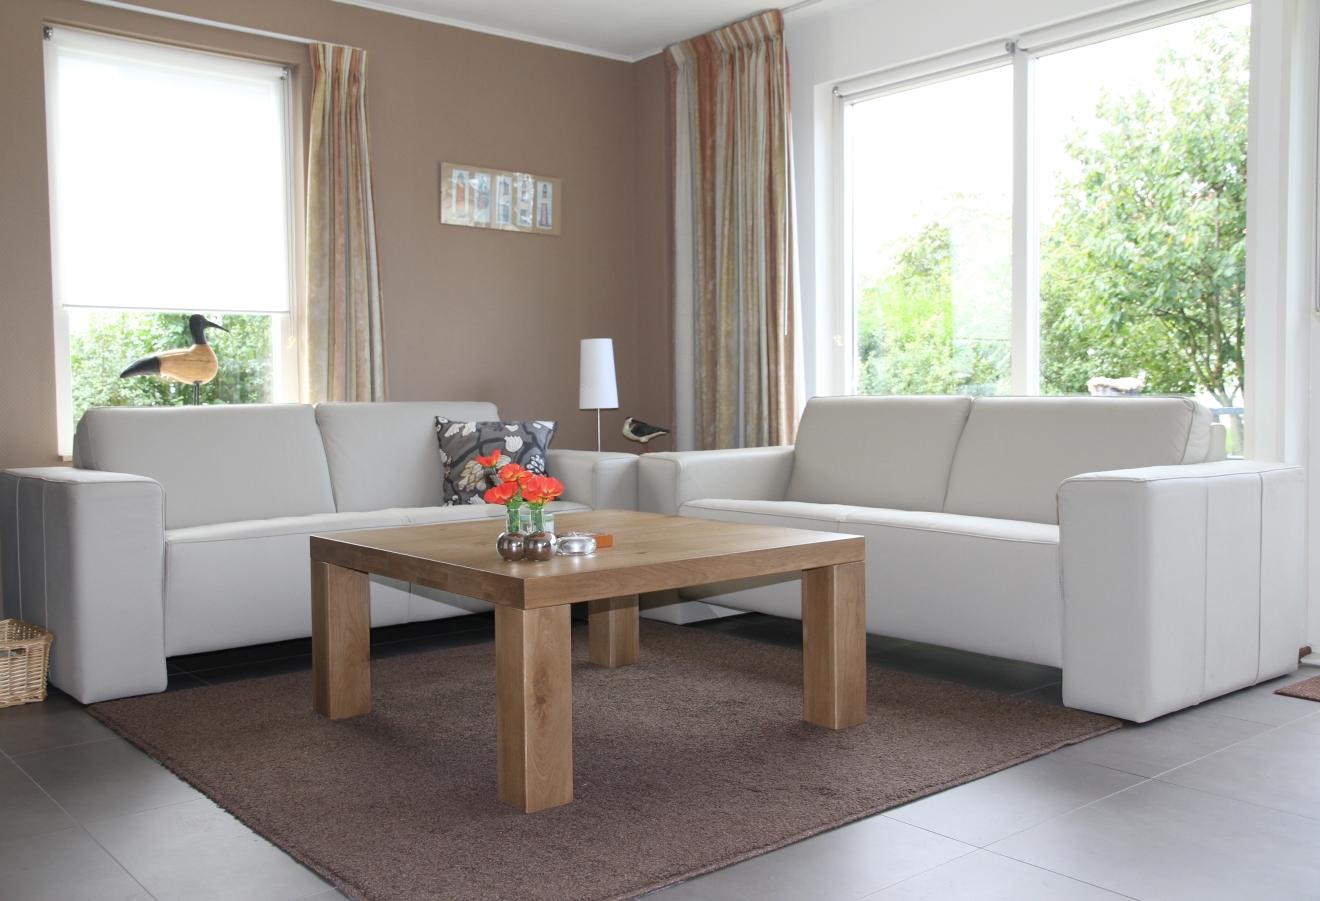 De salontafel in de woonkamer